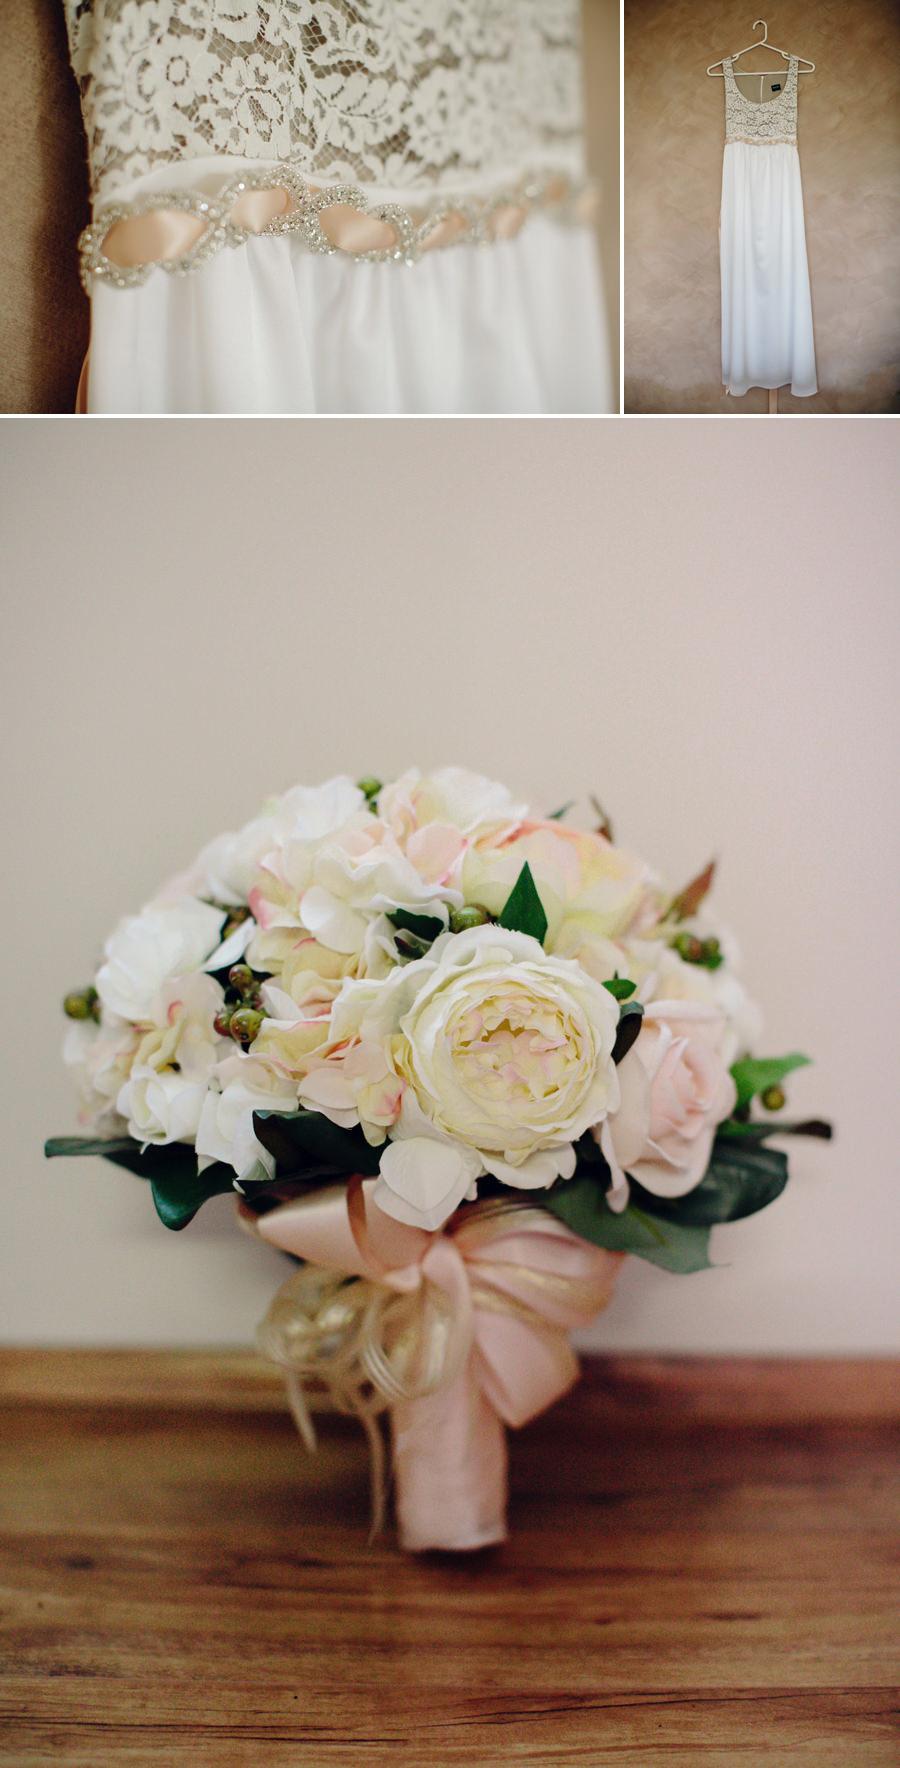 Northmead Wedding Photographers: Bride's details